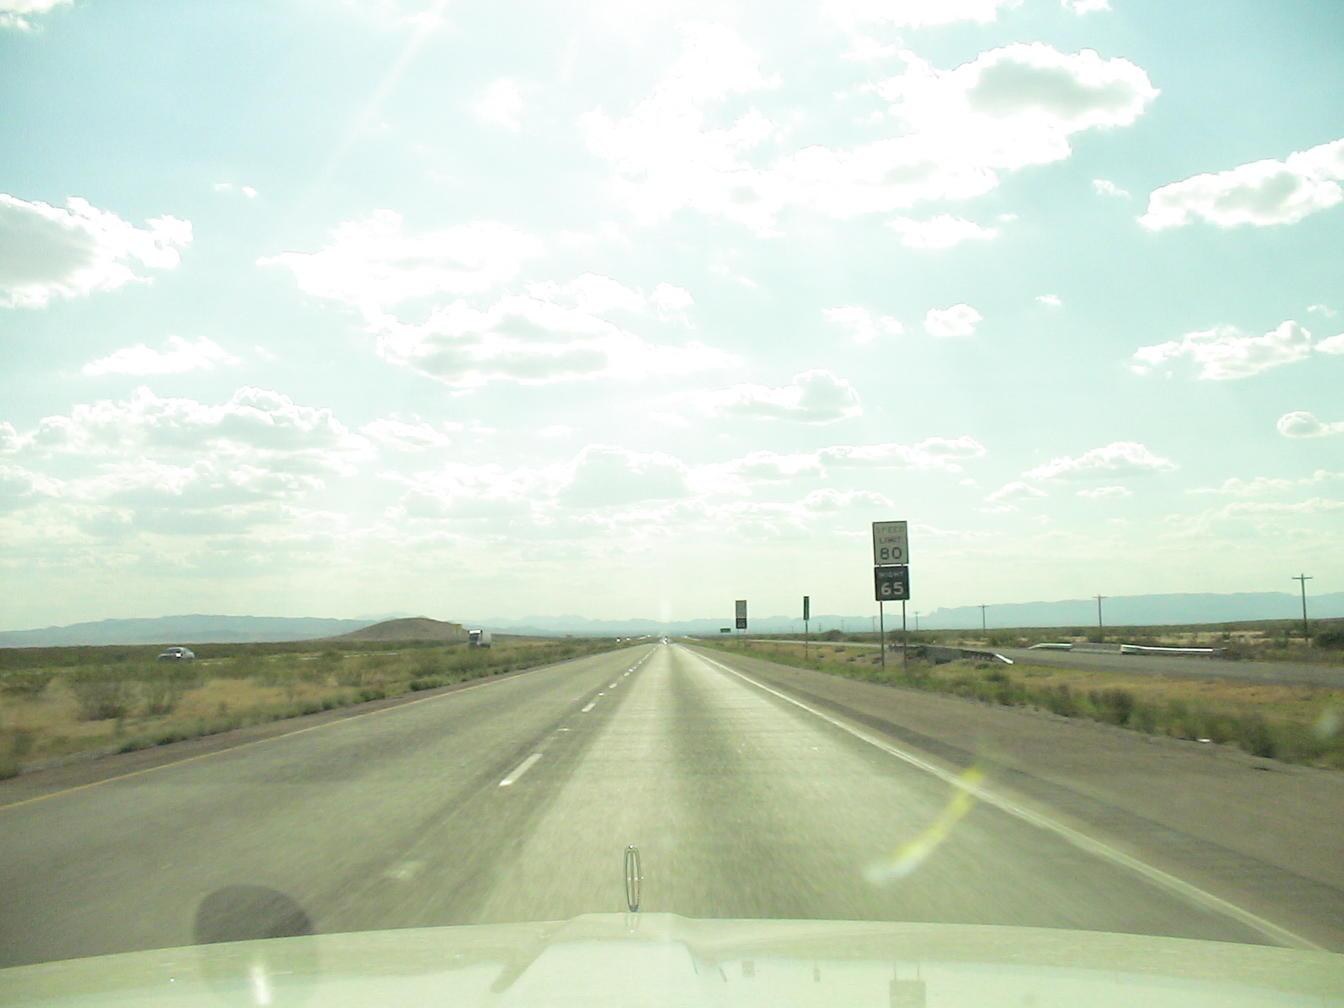 Night speed limits